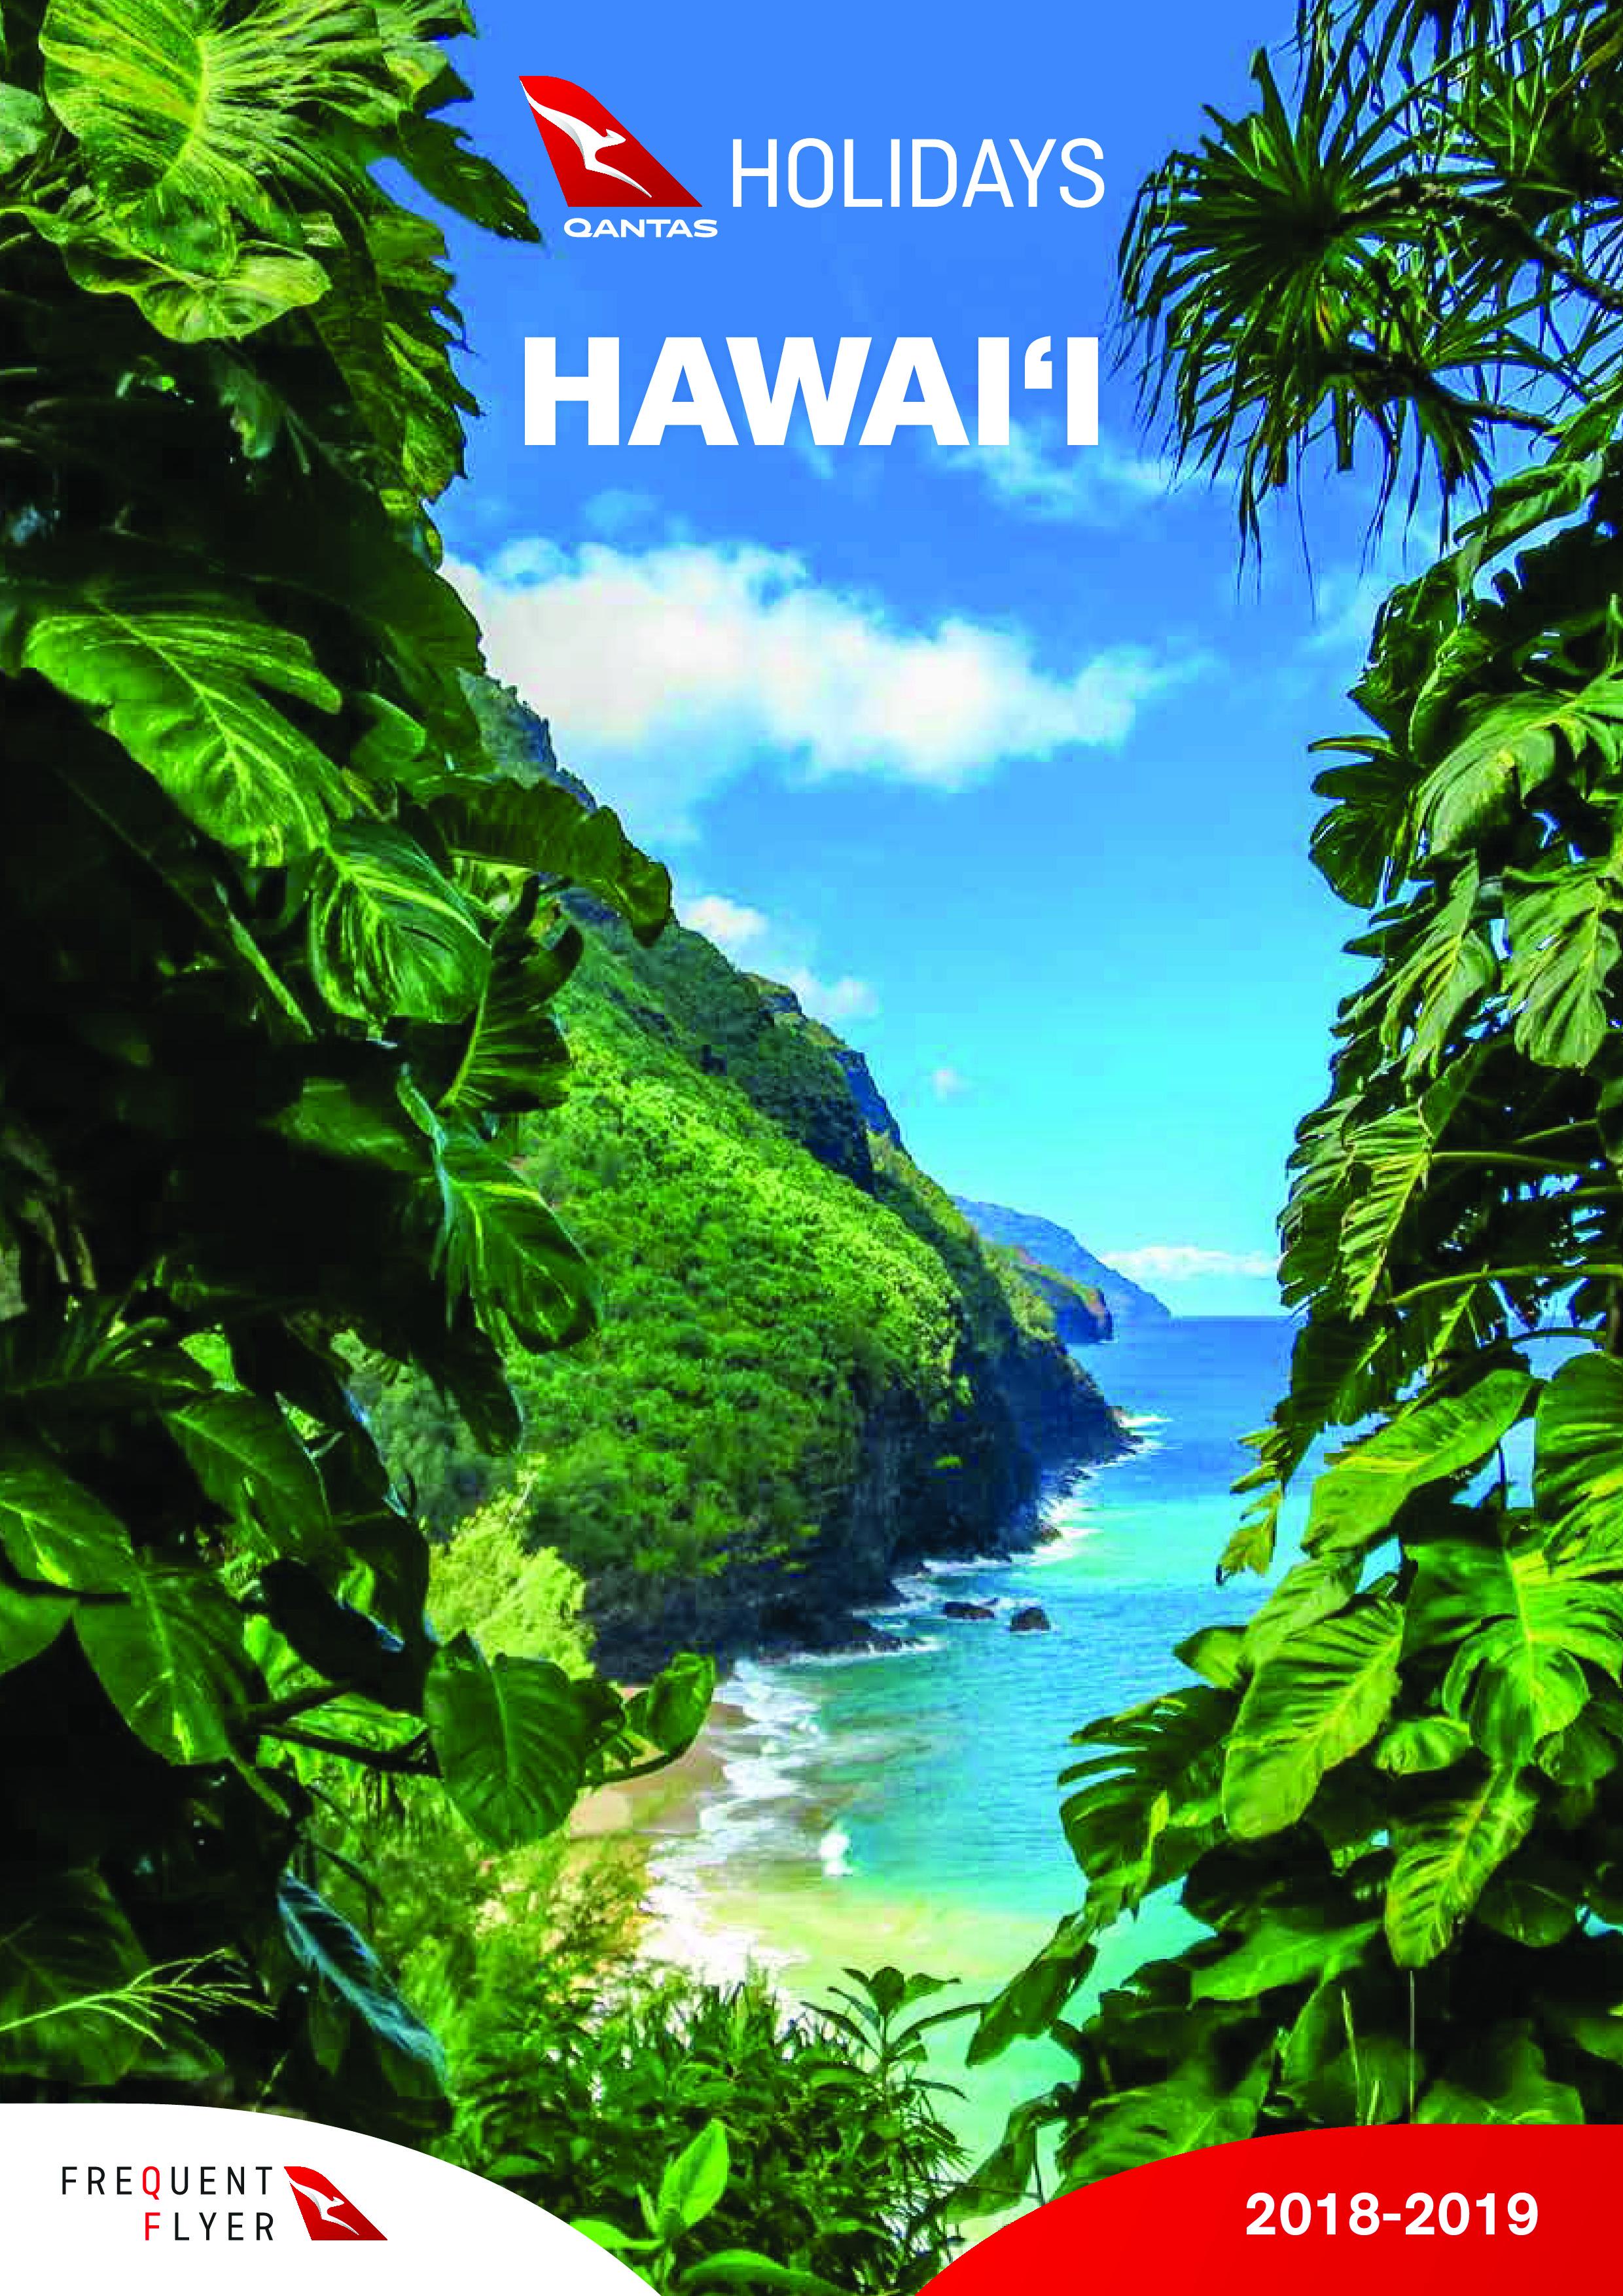 HAWAII-page-0.jpg